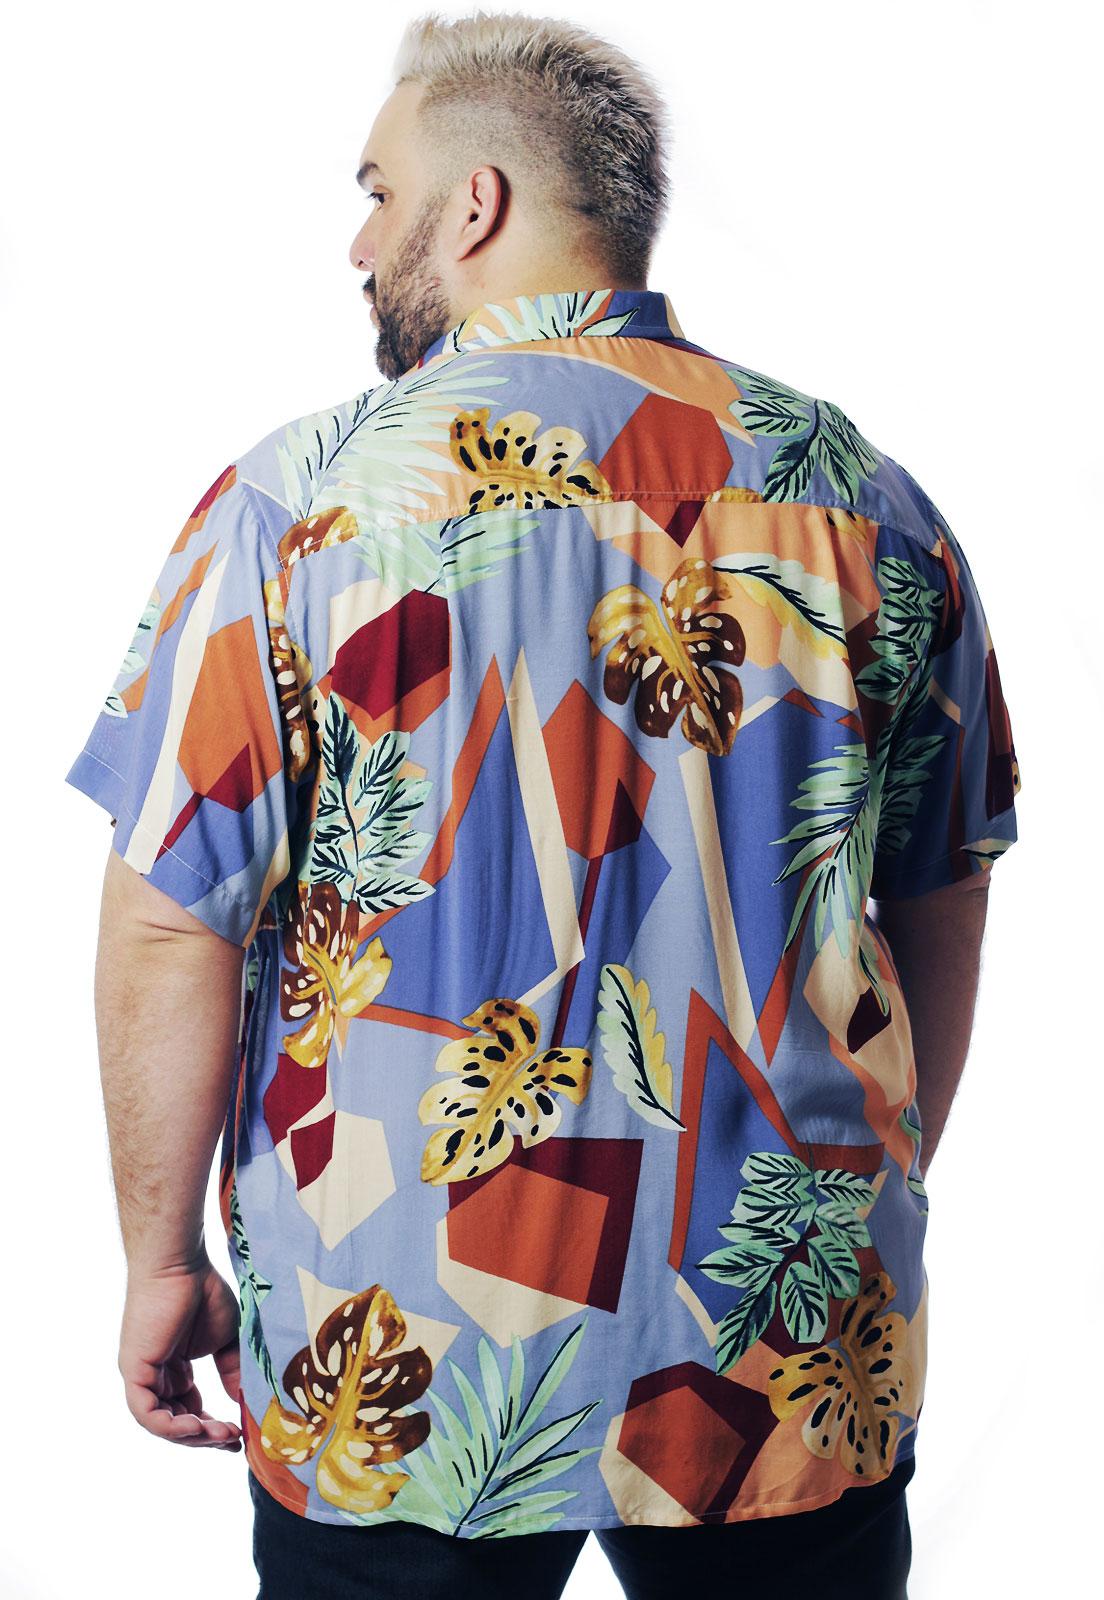 Camisa Plus Size Estampada Viscose Cherry Pop Geométrica (P Ao Plus Size)